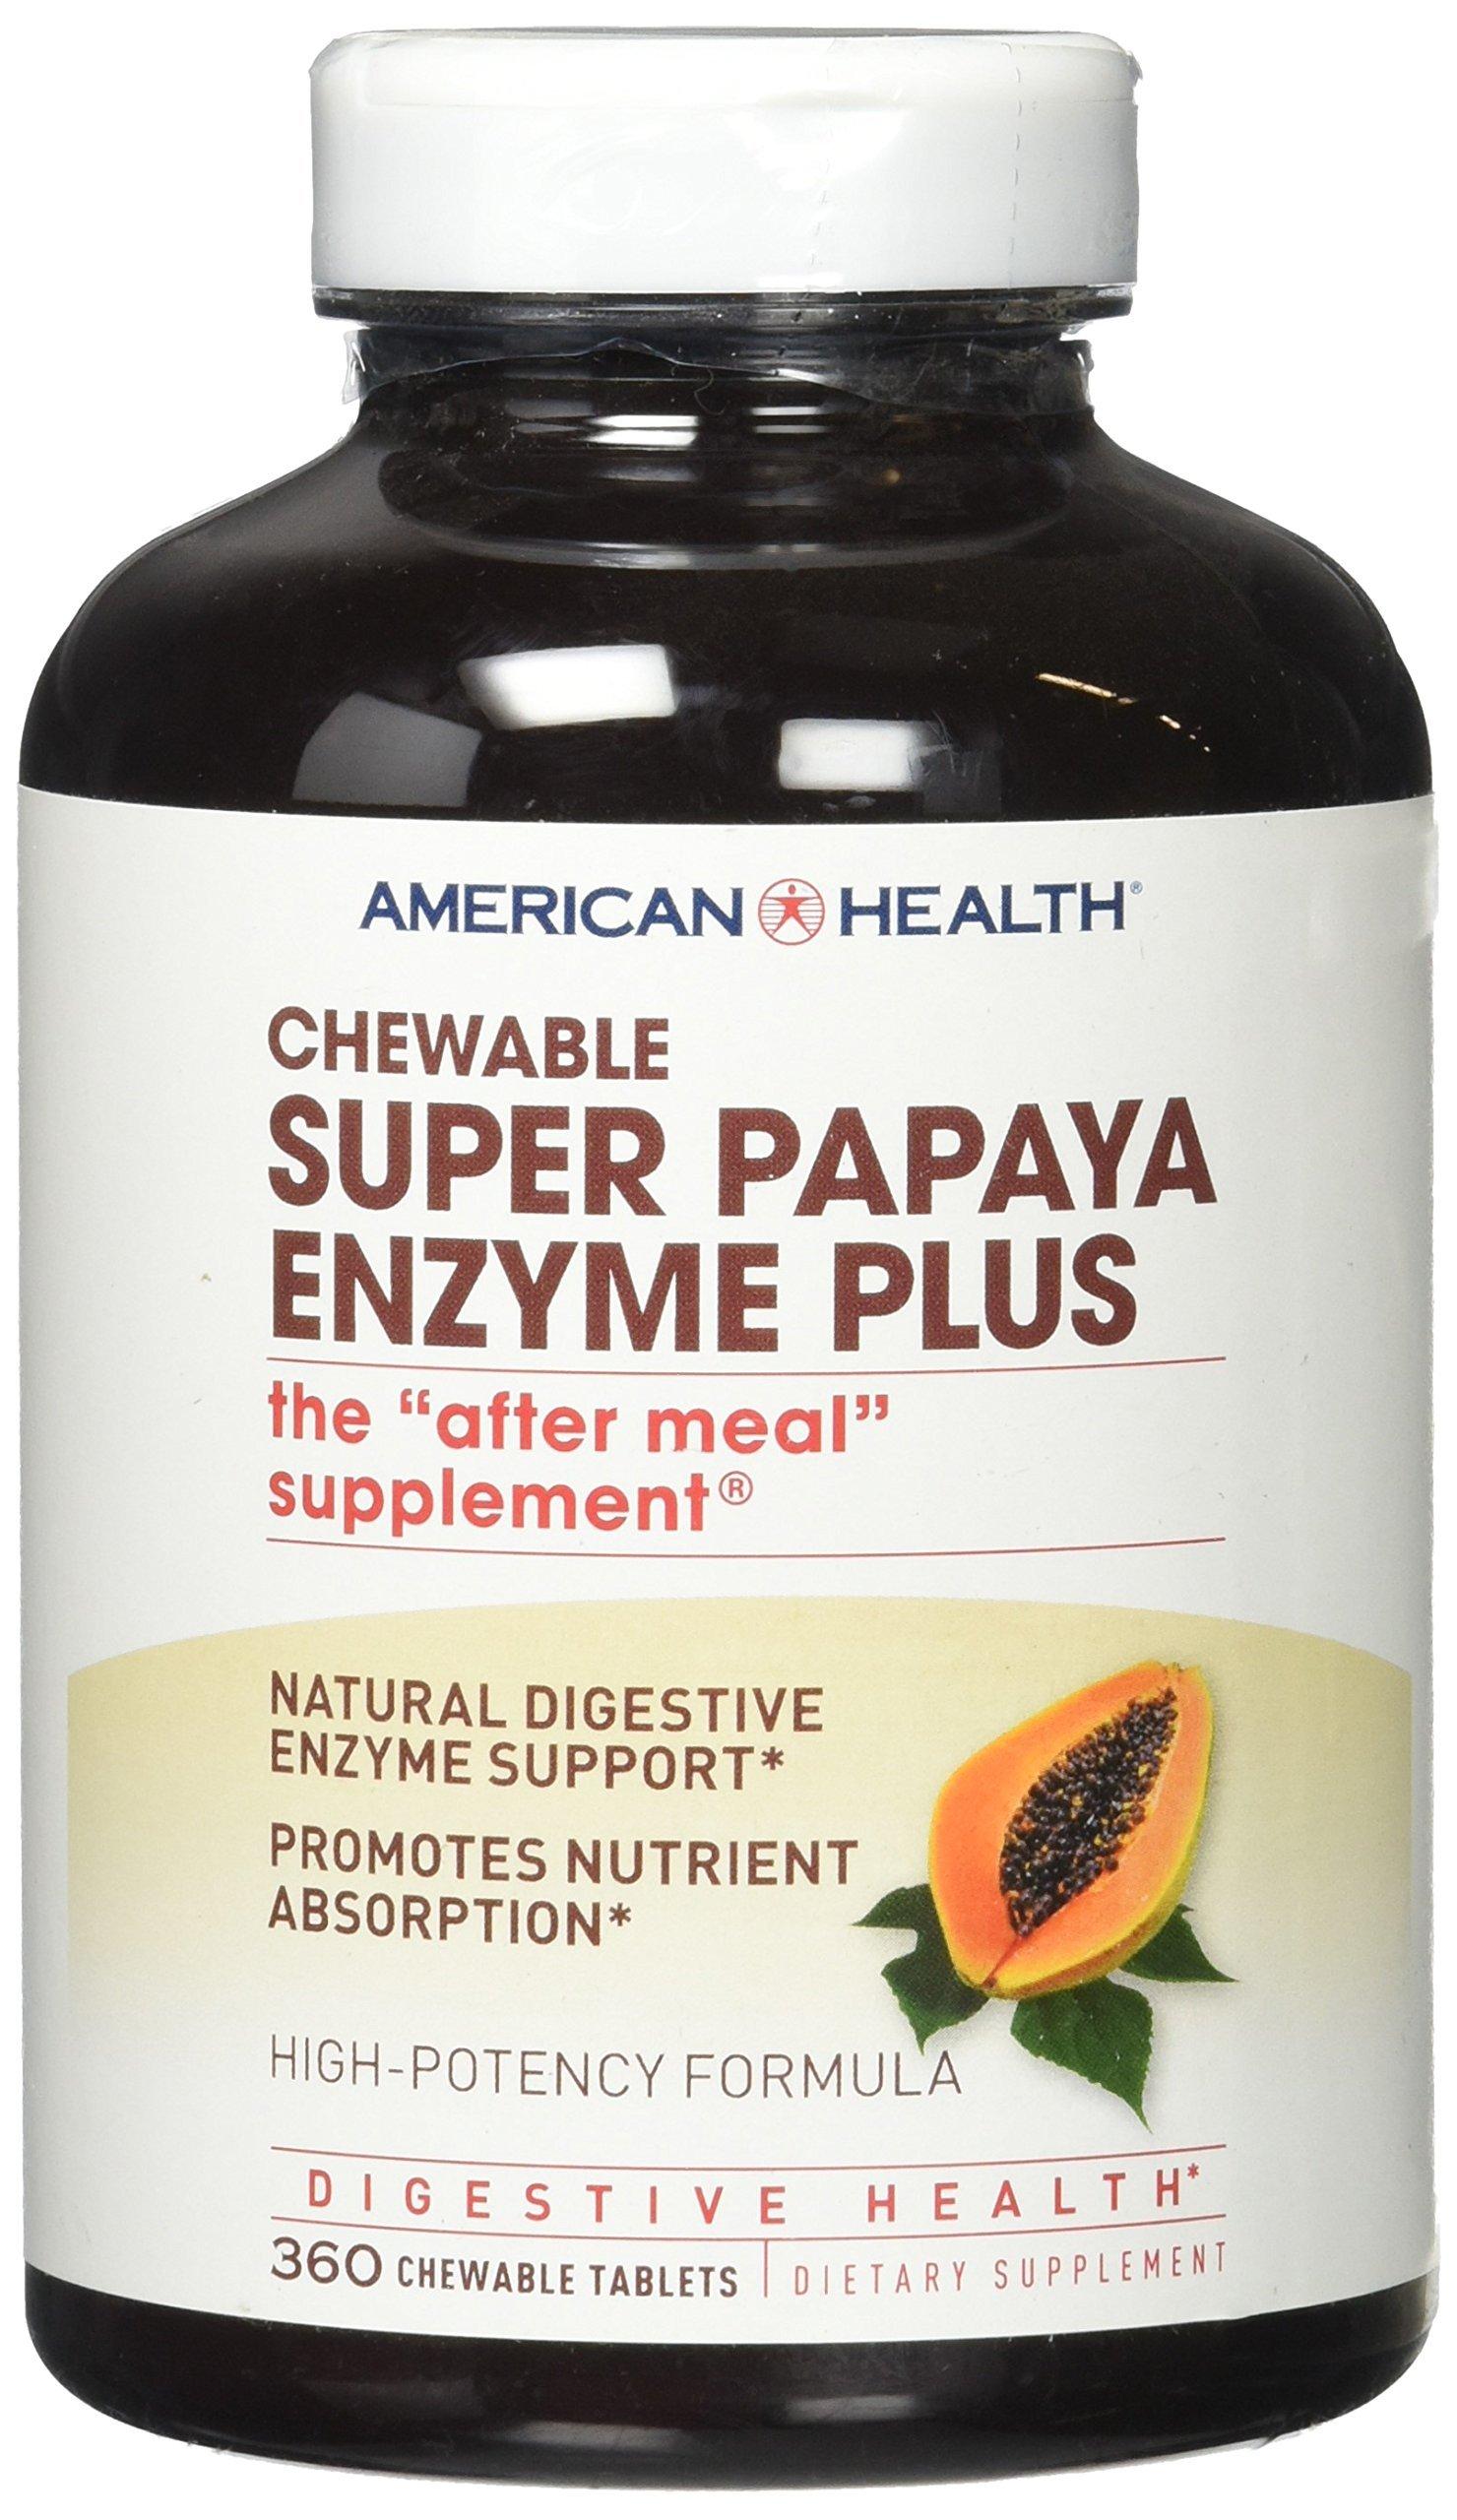 American Health Enzymes Chewable Super Papaya Enzyme Plus 360 tablets by American Health